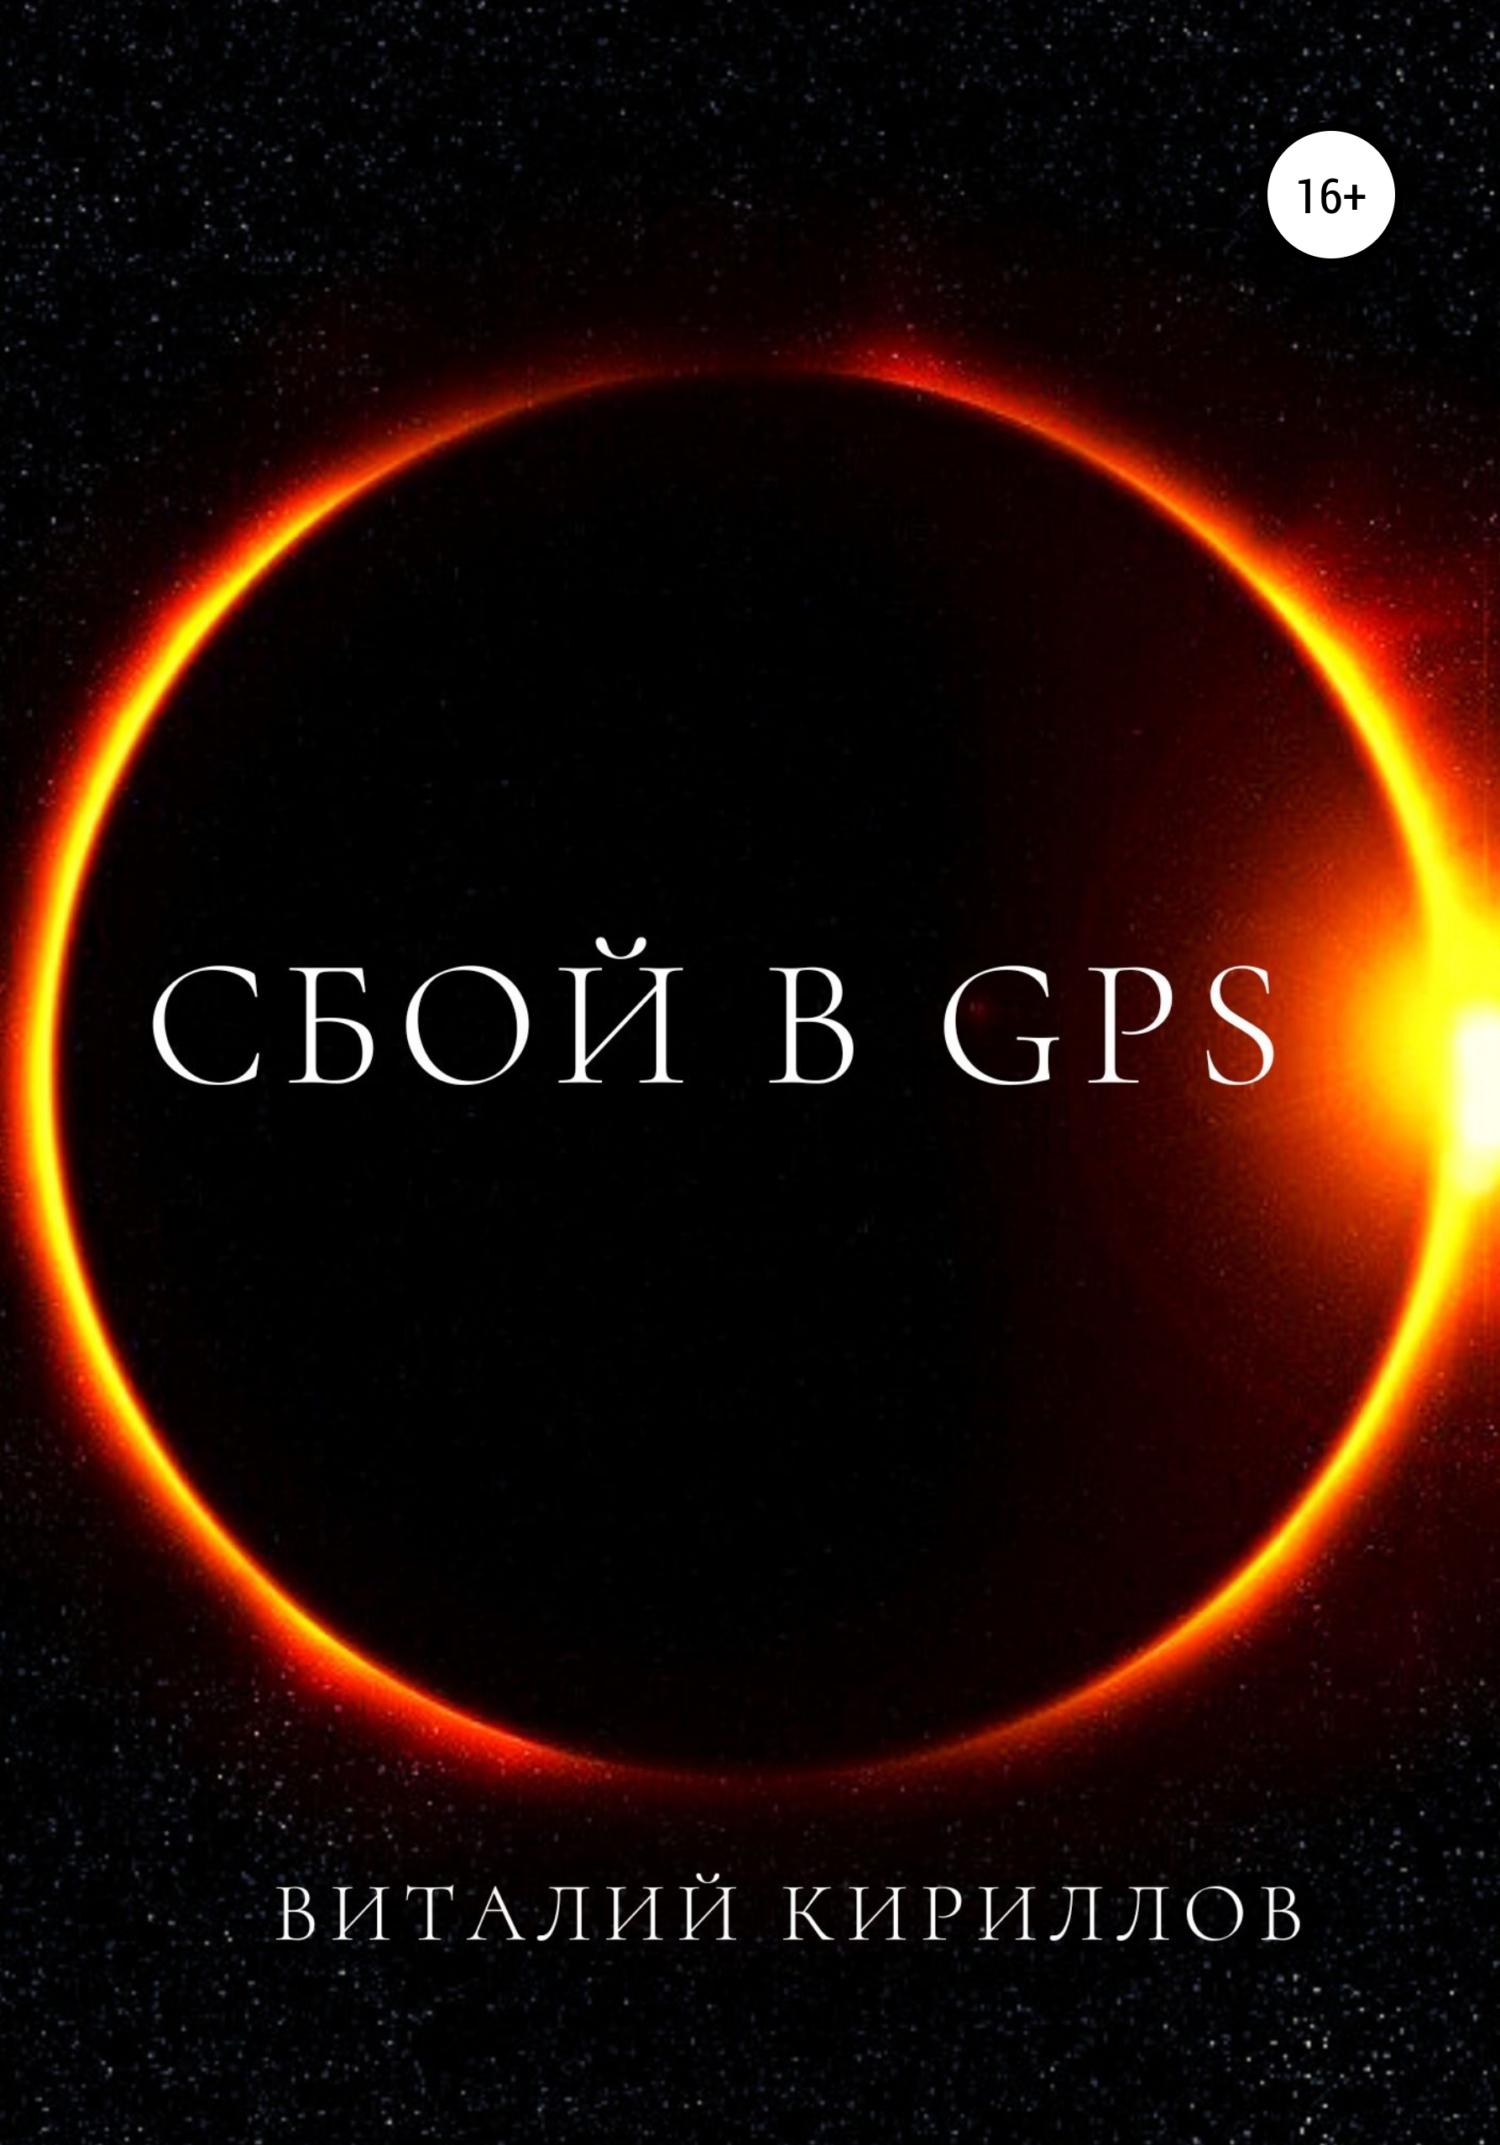 Виталий Александрович Кириллов Сбой в GPS виталий александрович кириллов я ехал на поезде в нью йорк